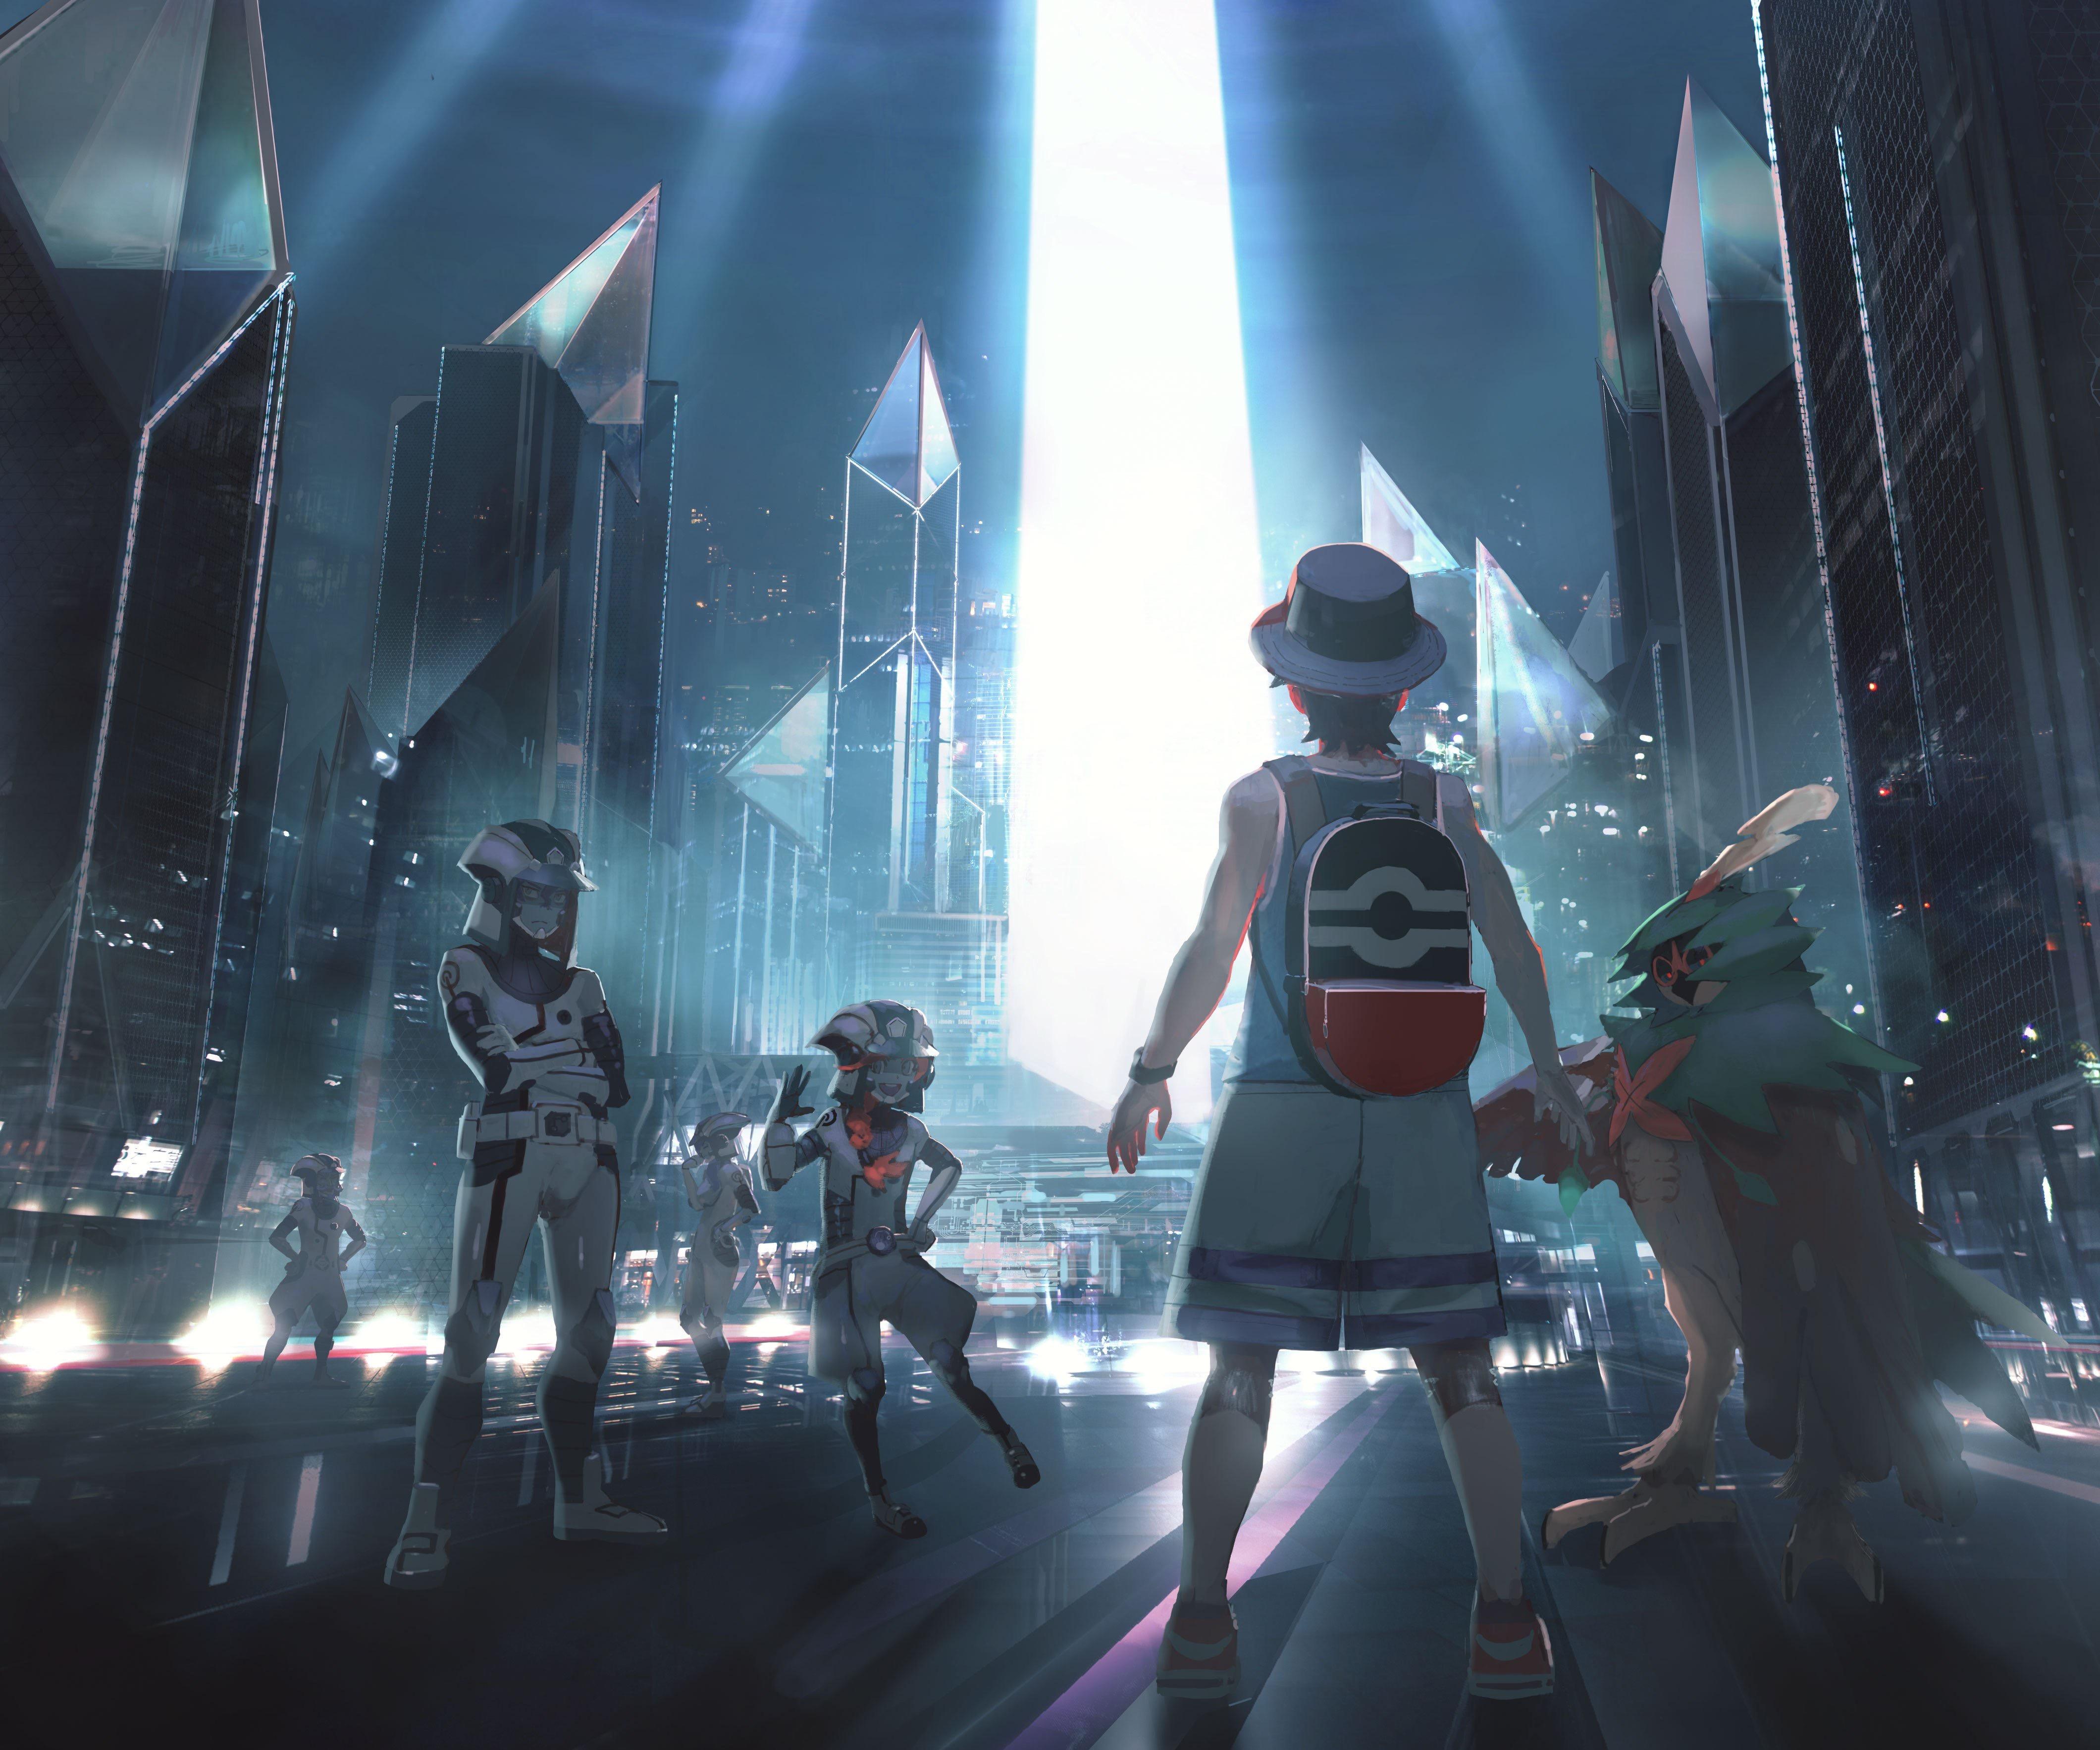 #pokemon Ultra Sun And Ultra Moon, #2018 Games, #games, - Pokemon Ultra Moon , HD Wallpaper & Backgrounds